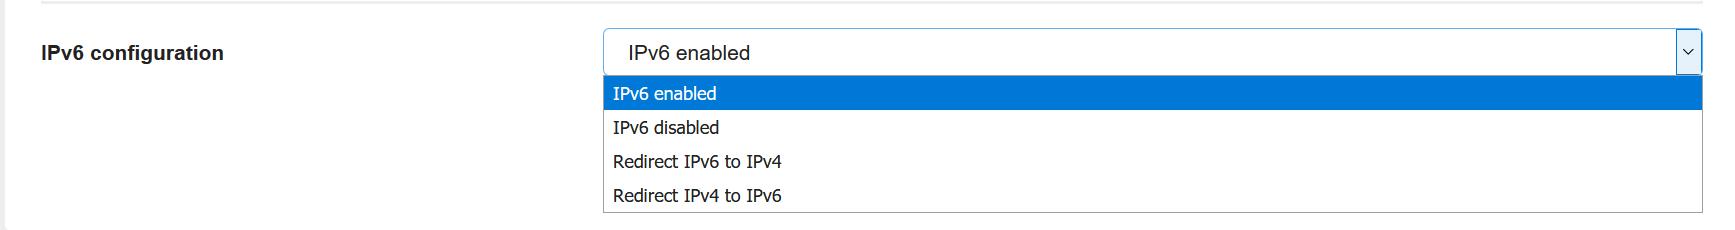 ha-ip ipv6 configuration